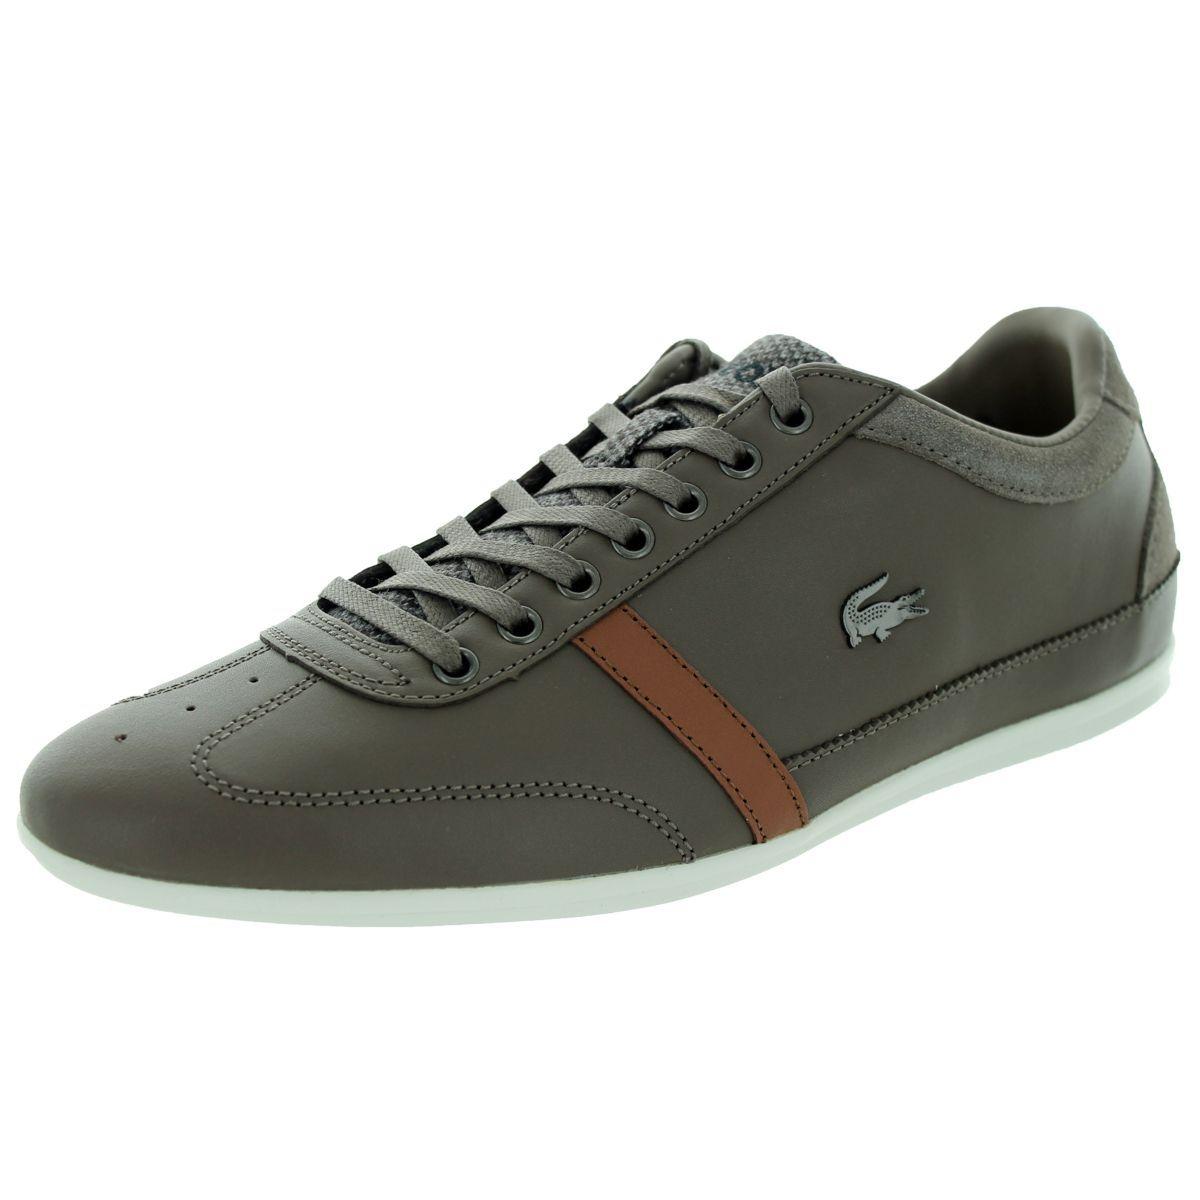 4e83707917 Lacoste Men's Misano 32 Srm Khaki Casual Shoe Lacoste Shoes, Lacoste Men,  Buy Shoes